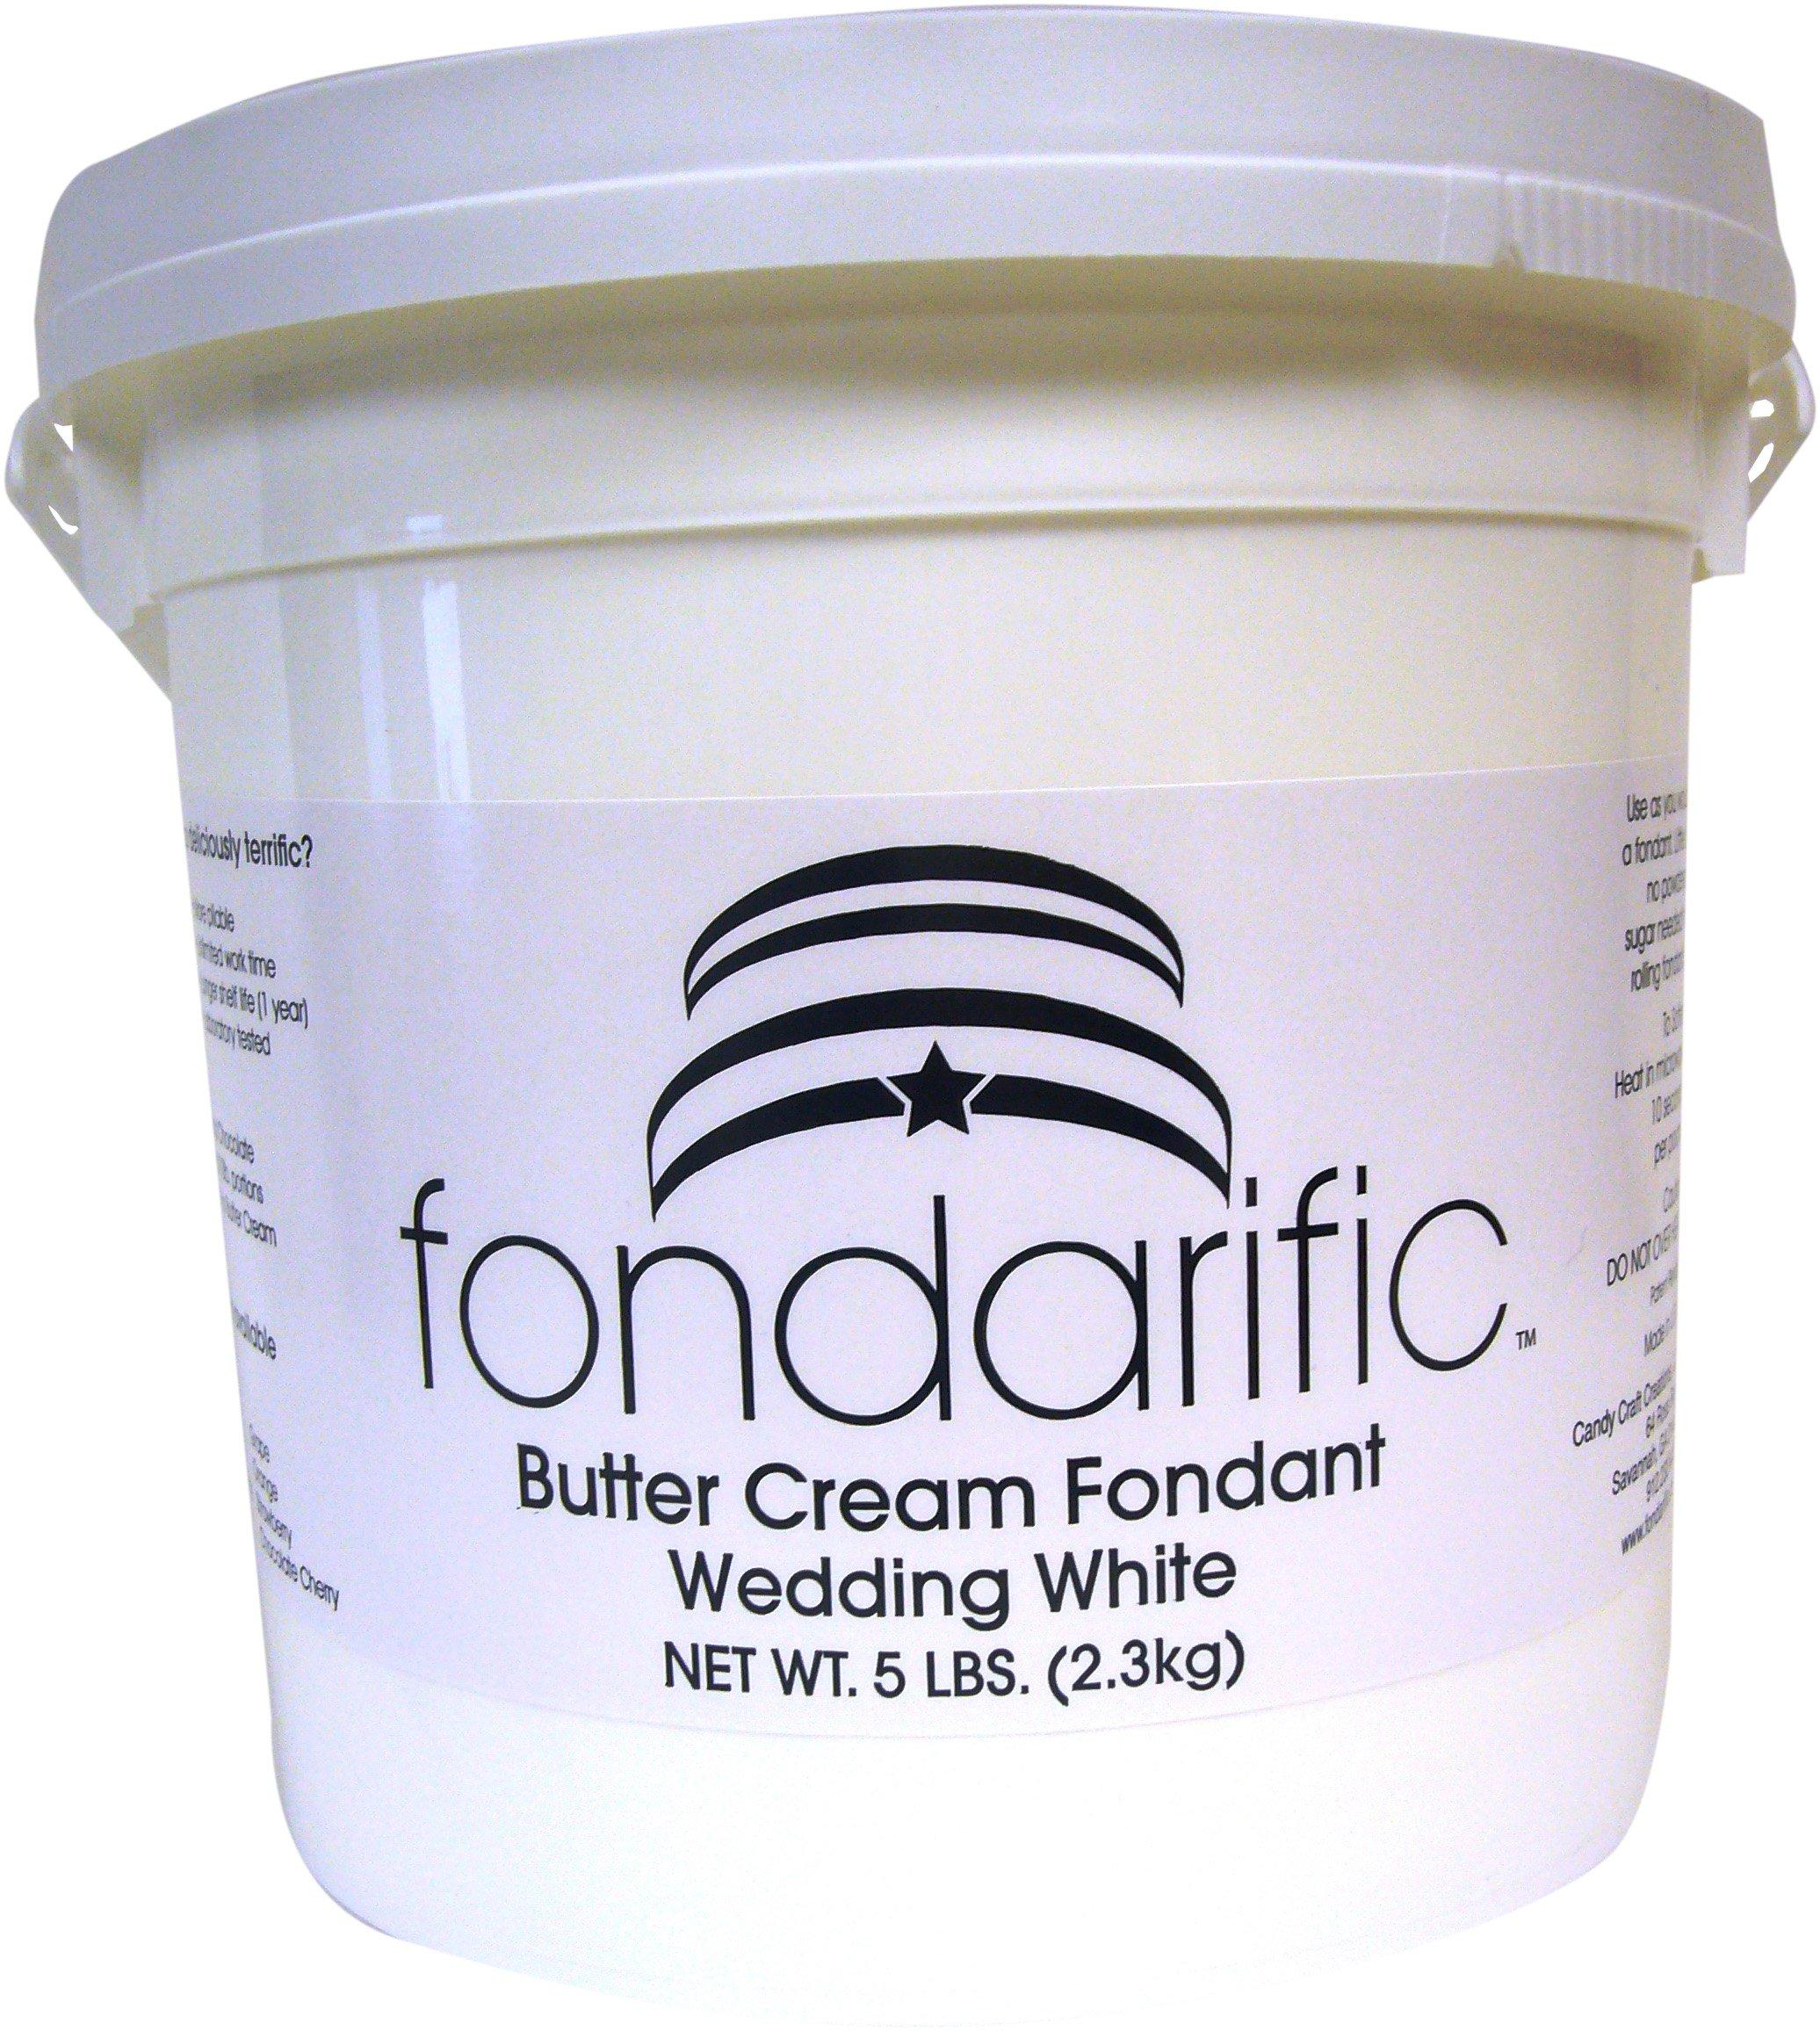 Fondarific Buttercream Wedding White Fondant, 5-Pounds by Fondarific (Image #2)